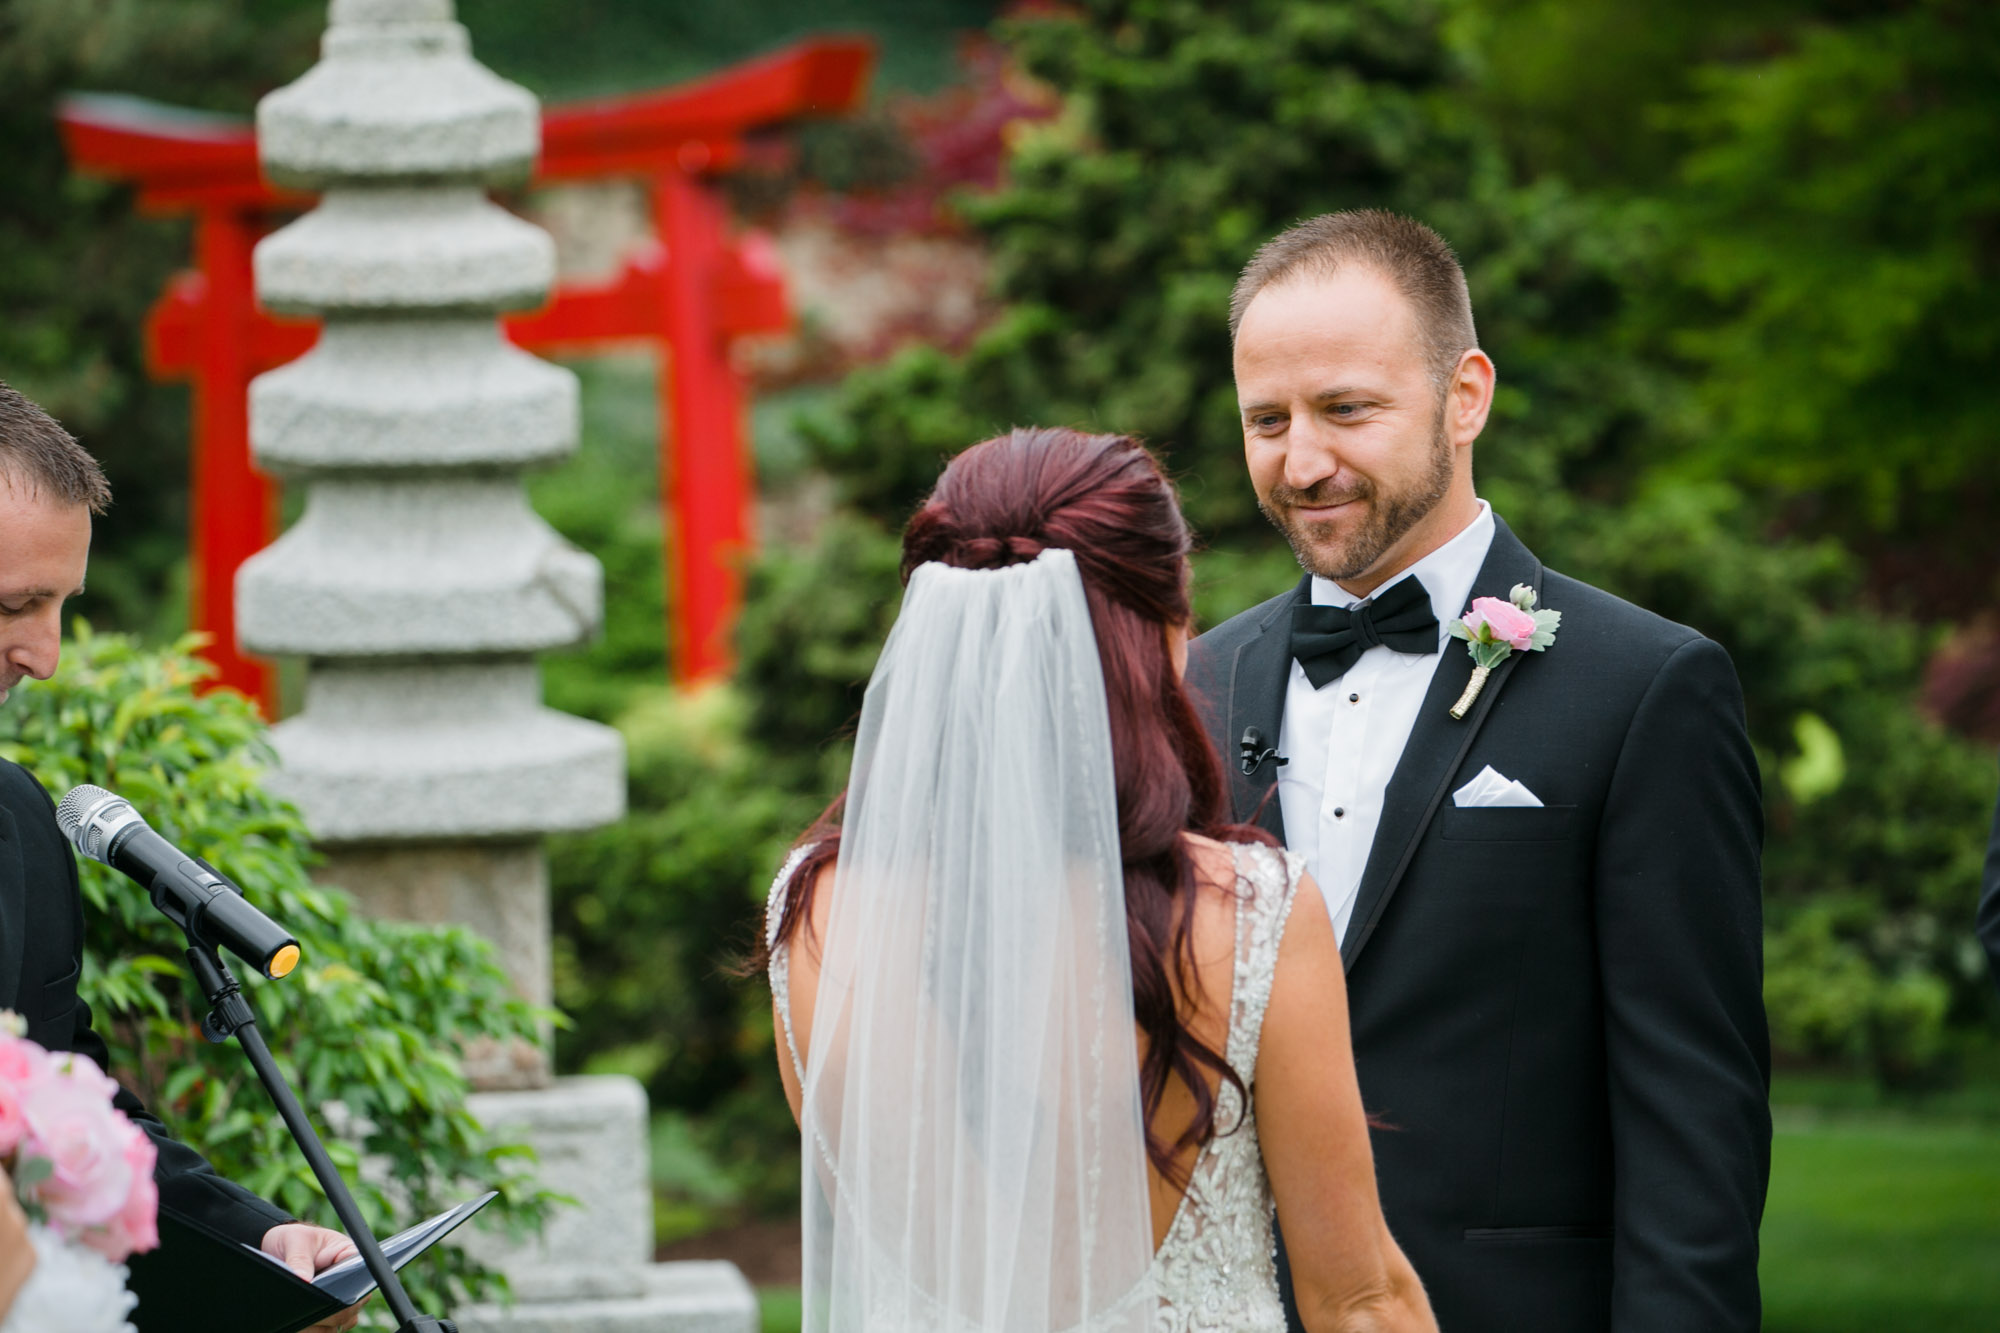 hensville-wedding-downtown-toledo-ohio (40 of 103).jpg